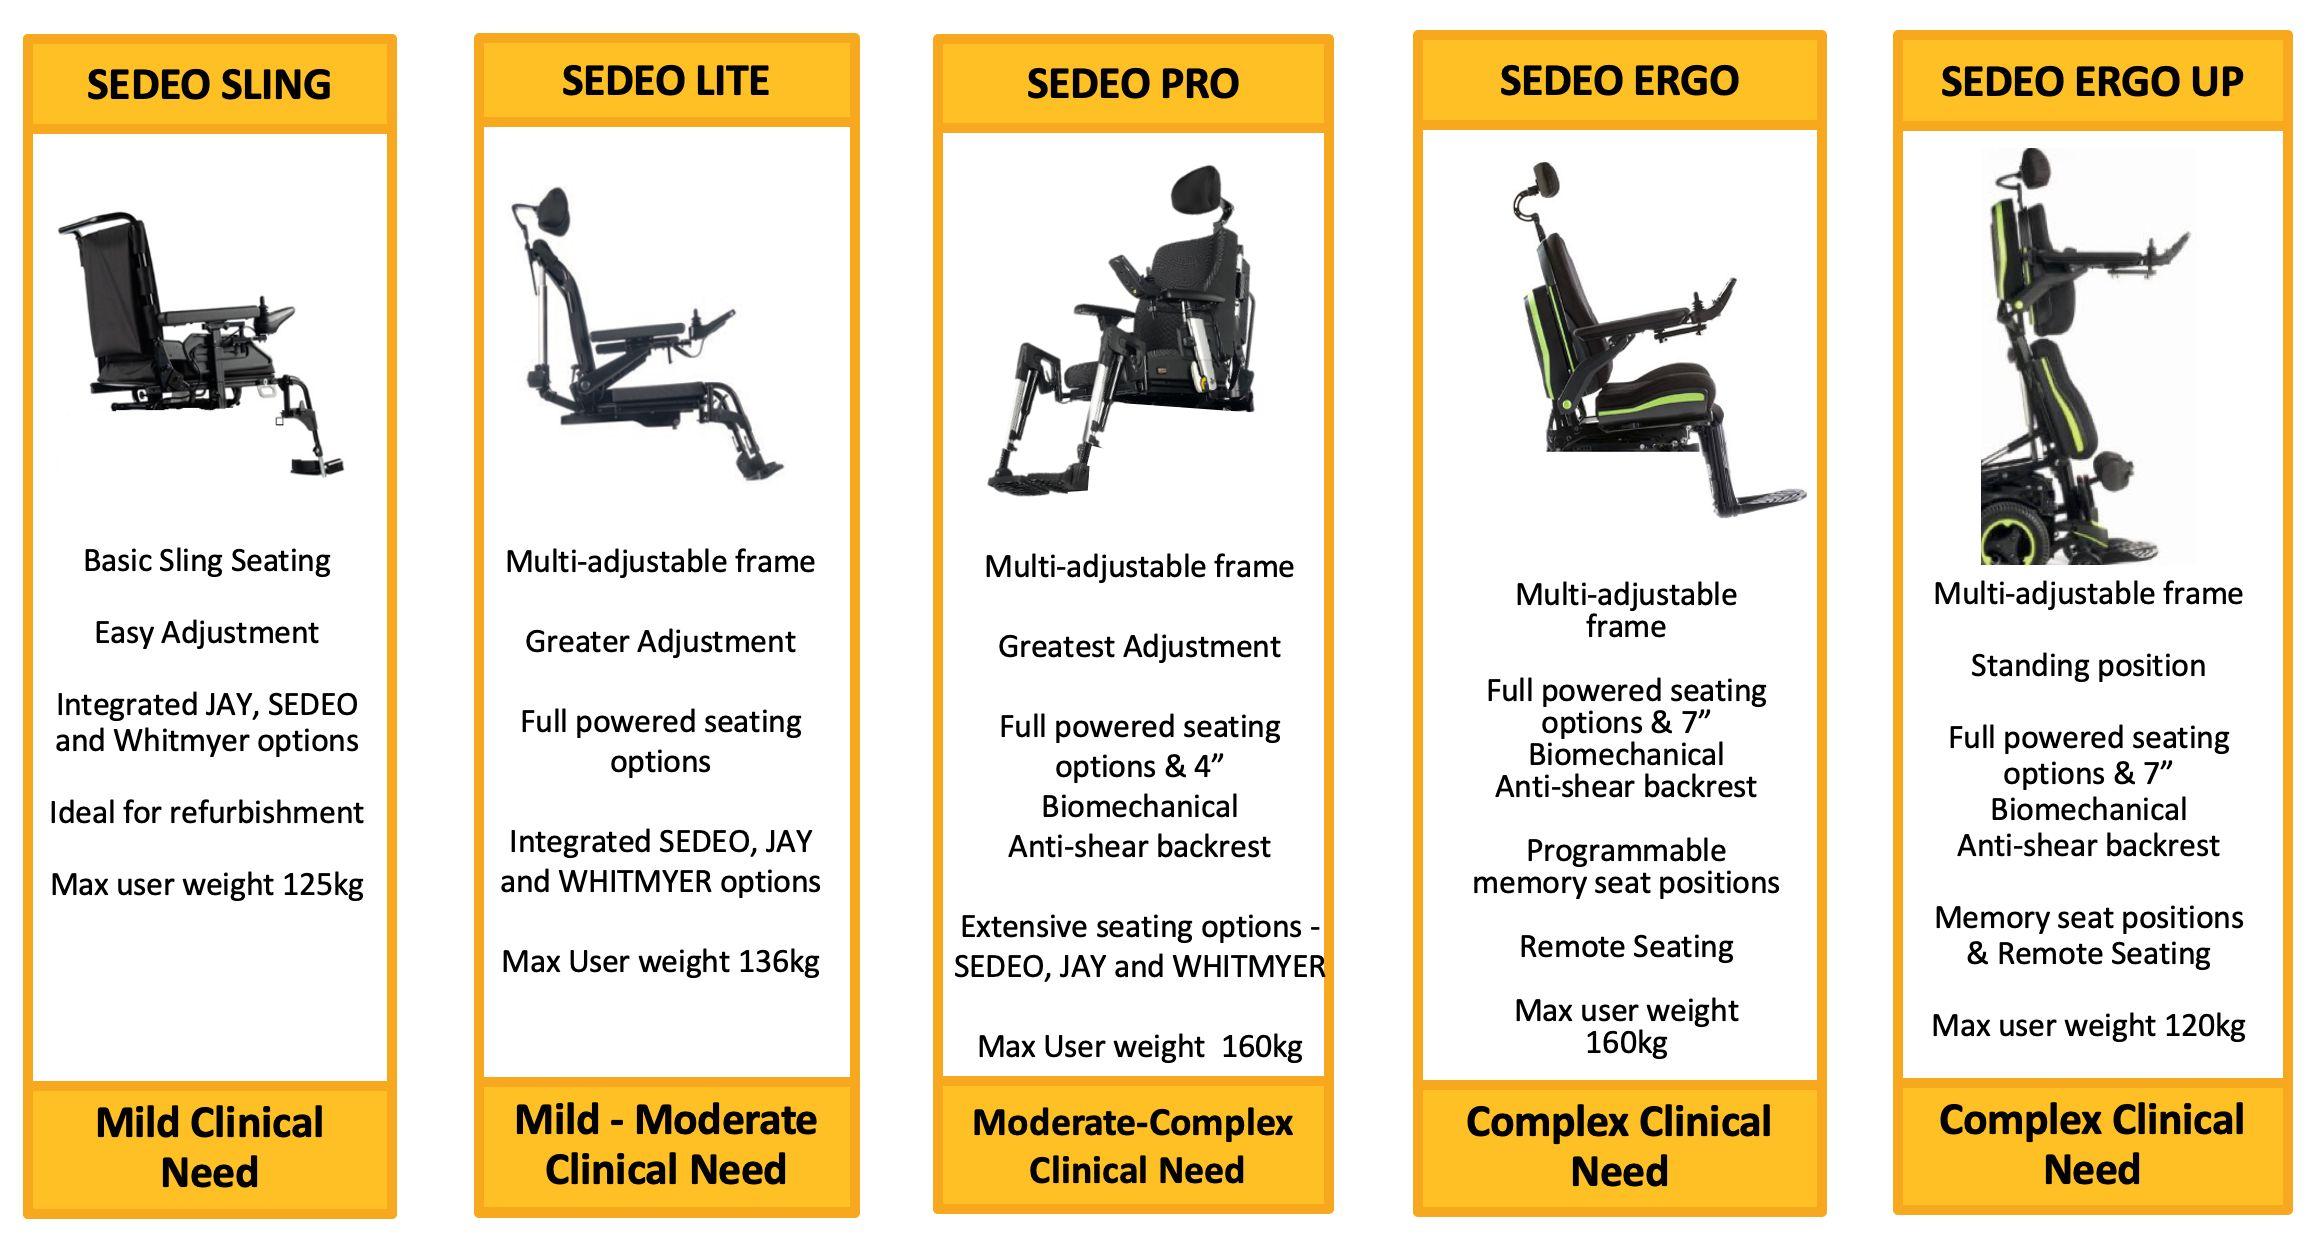 sedací systém SEDEO